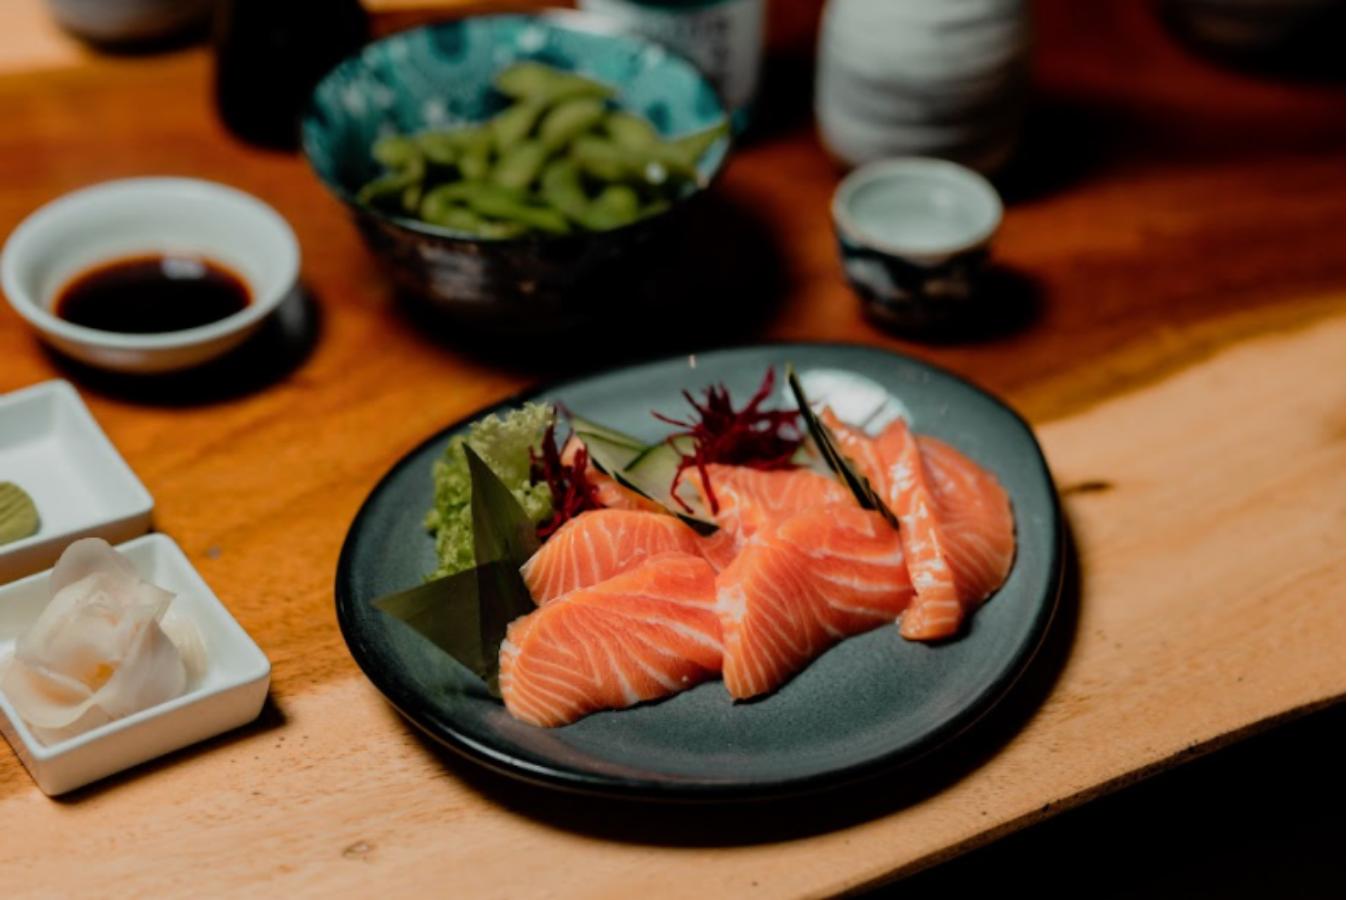 comida japonesa, salmon